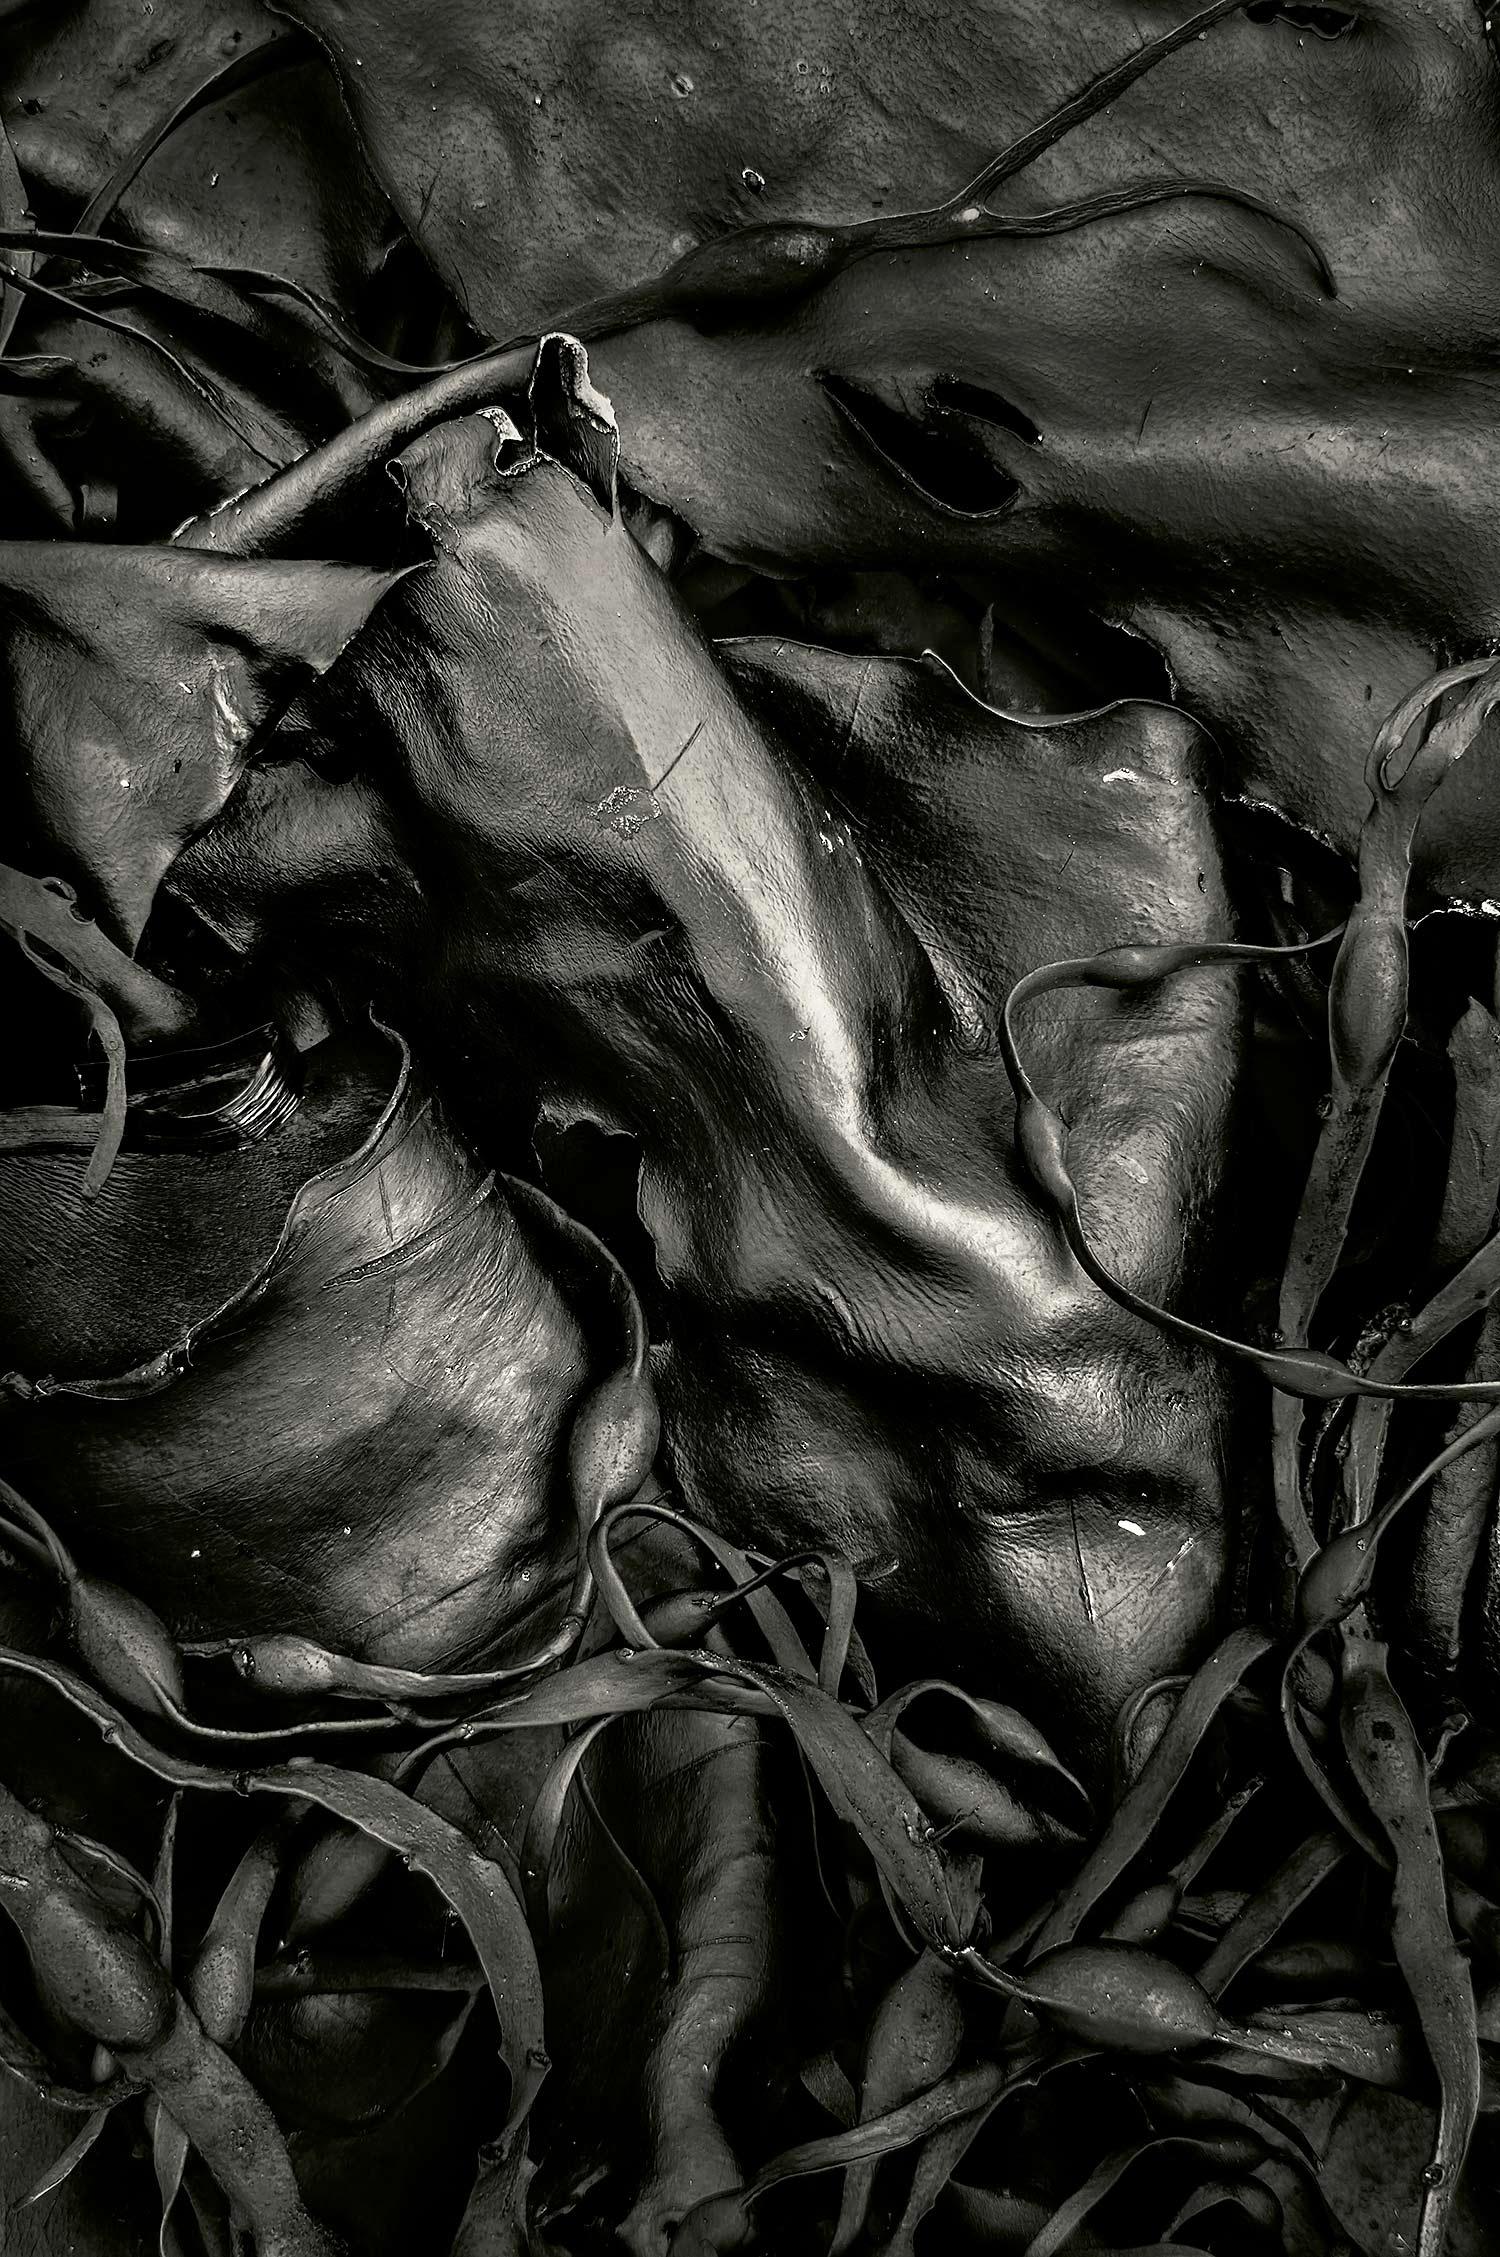 Seaweed 516, Seawall, Maine, 2012